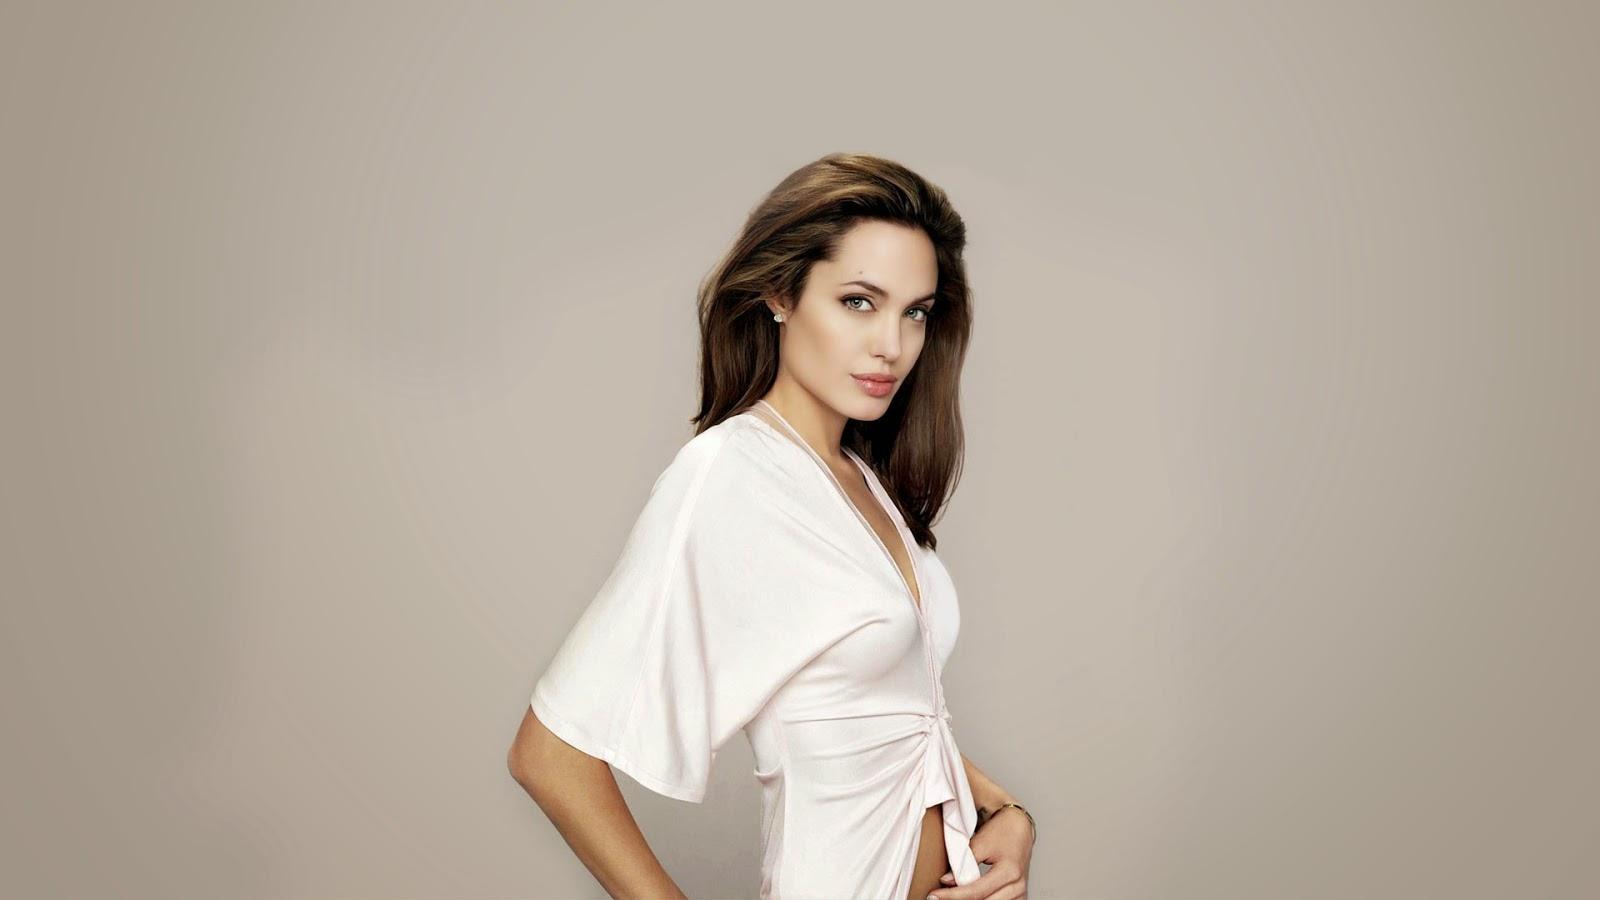 Angelina Jolie Hair Styles: Angelina Jolie Hairstyles 2014